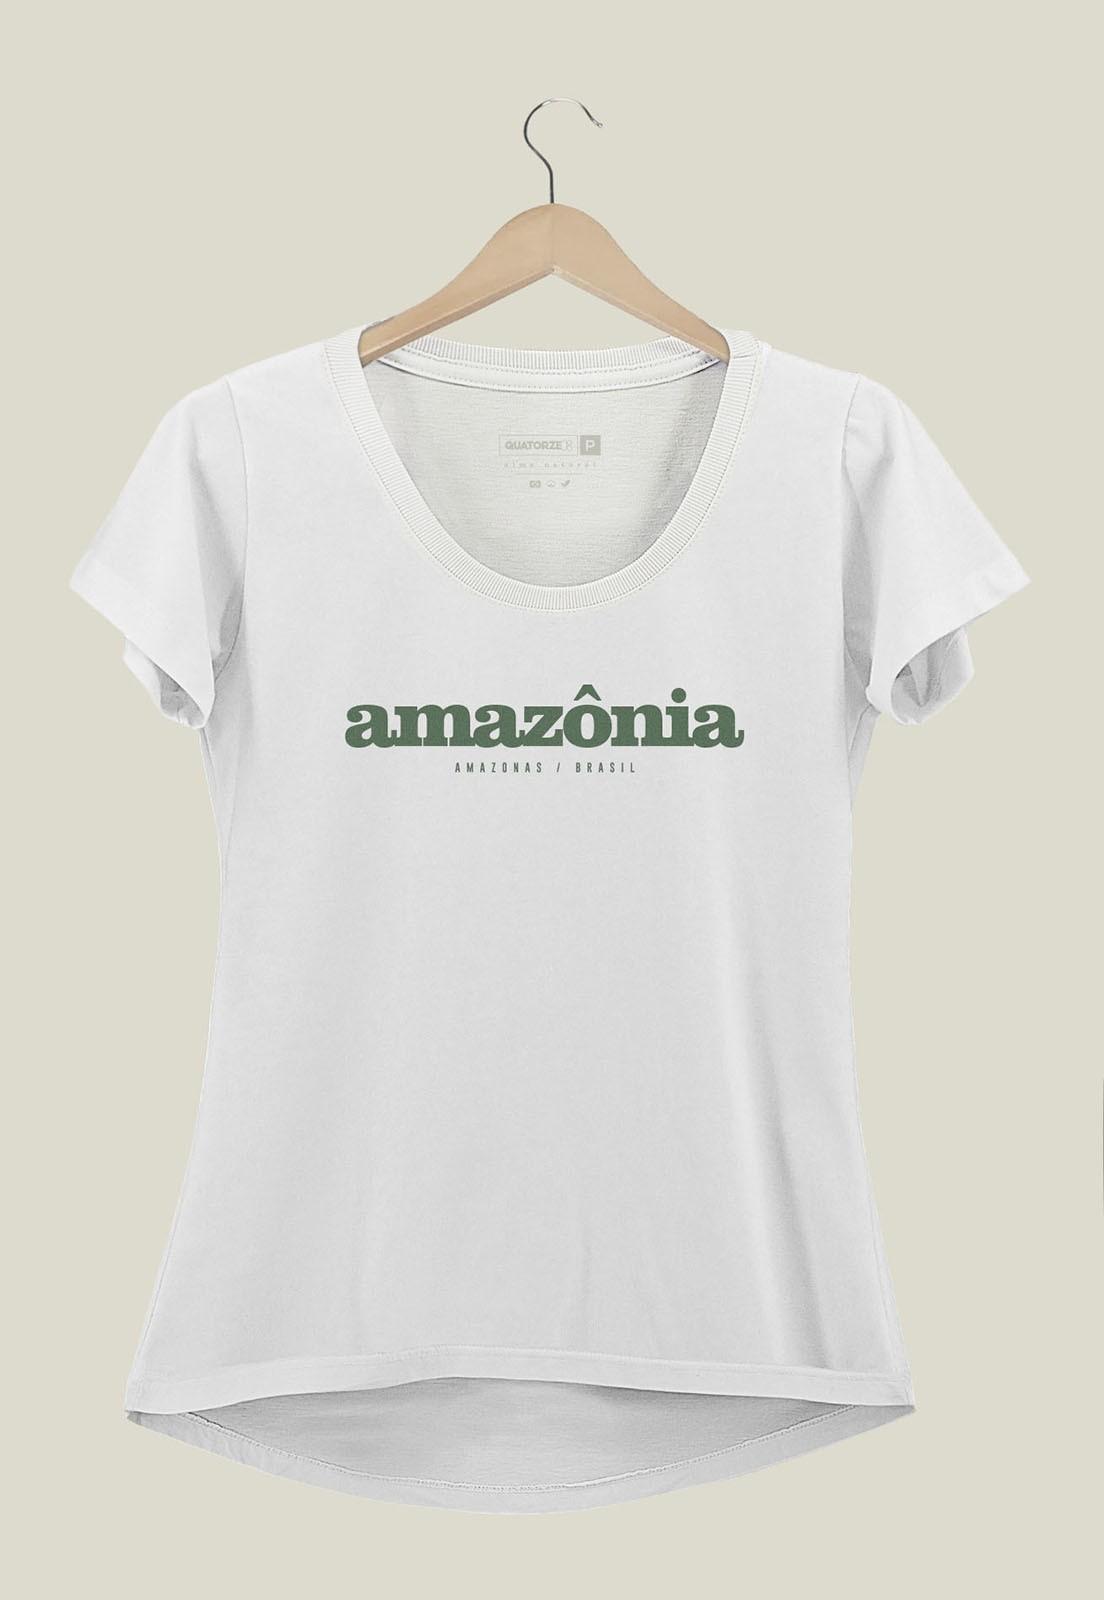 Camiseta Feminina Destinos Amazônia Branco